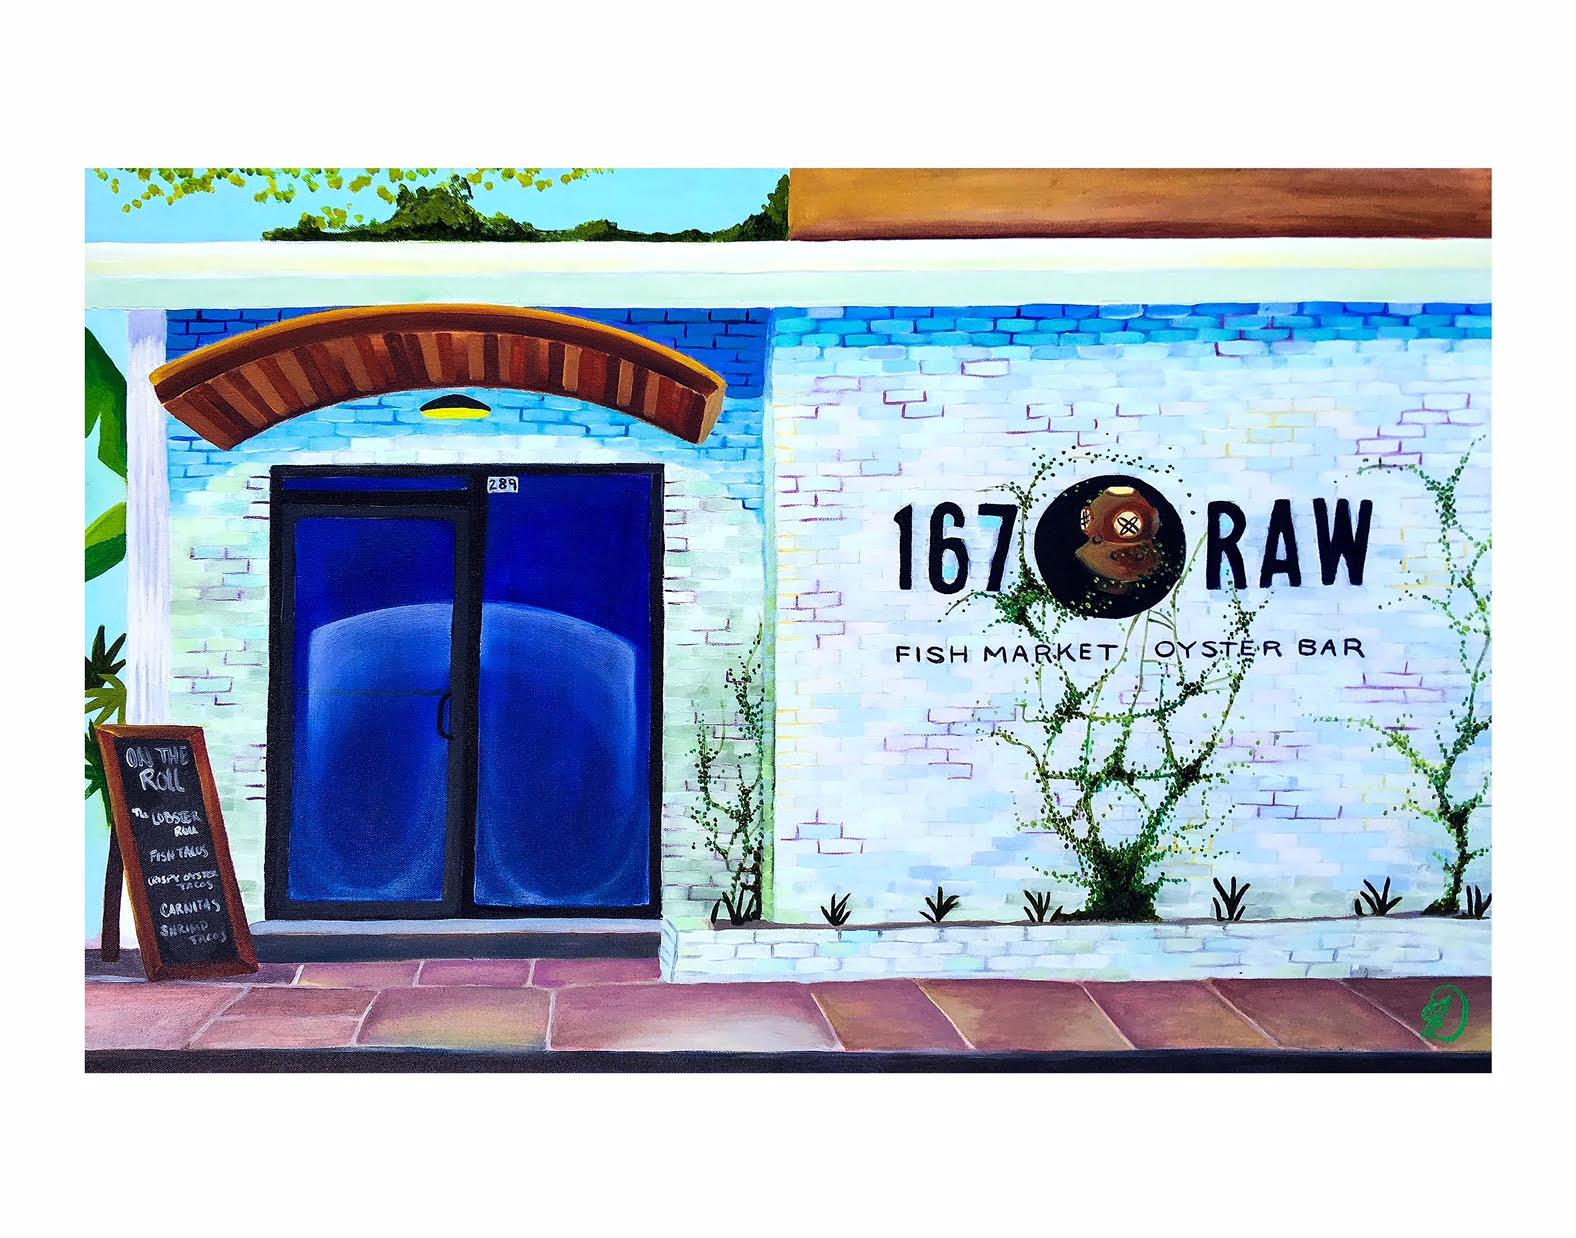 "167 Raw - 11"" X 14"" archival print$50"